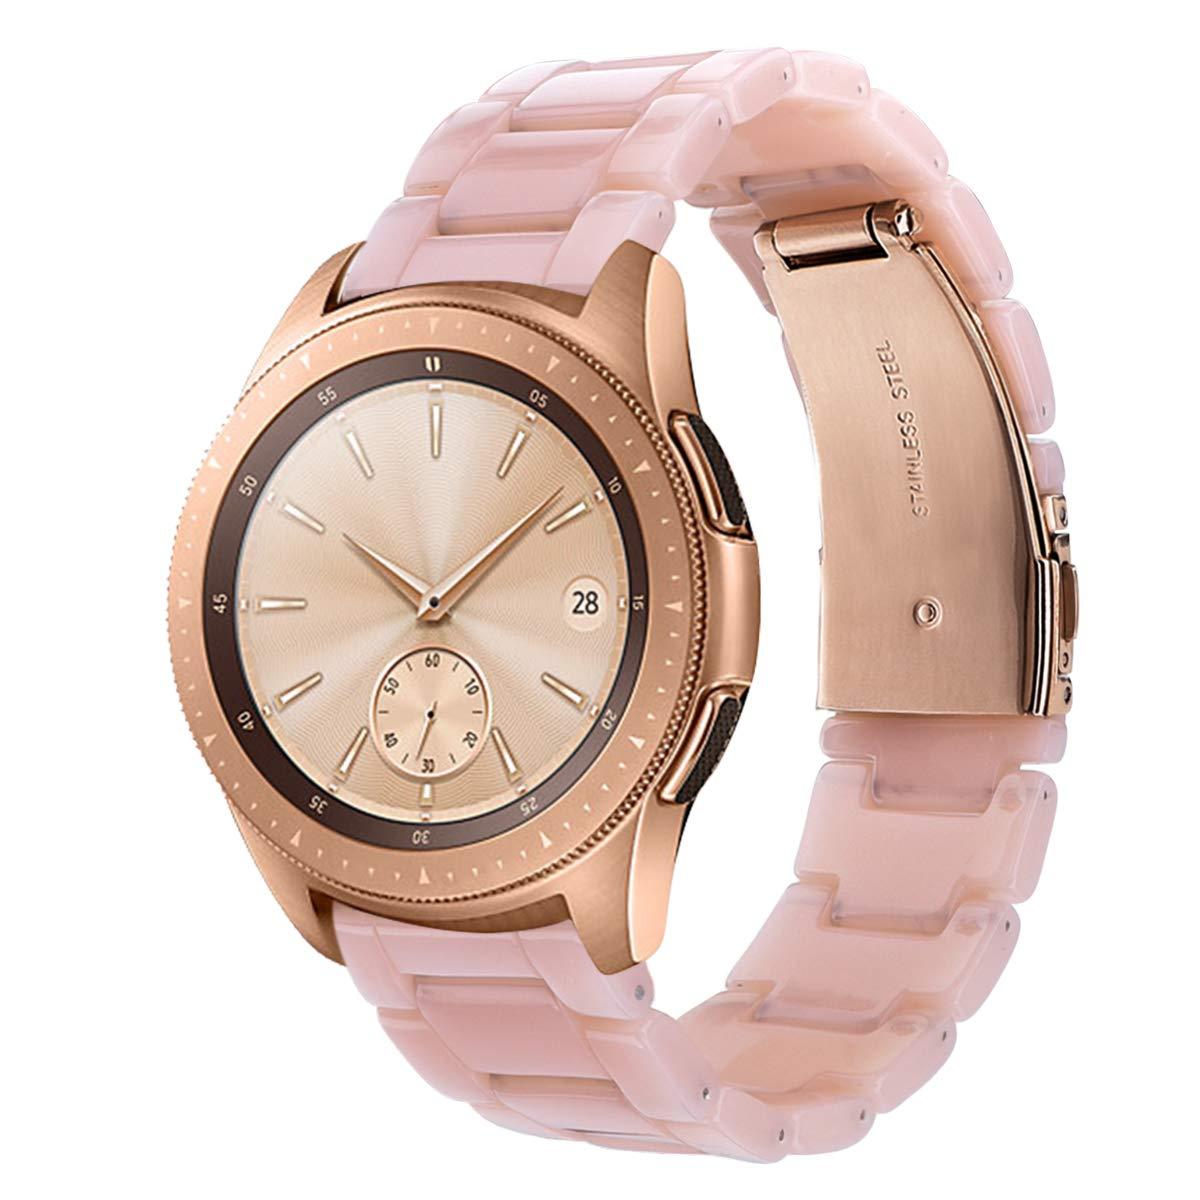 Vmoro Bands For Galaxy Watch 42mm Band Rose Gold Women 20mm Fashion